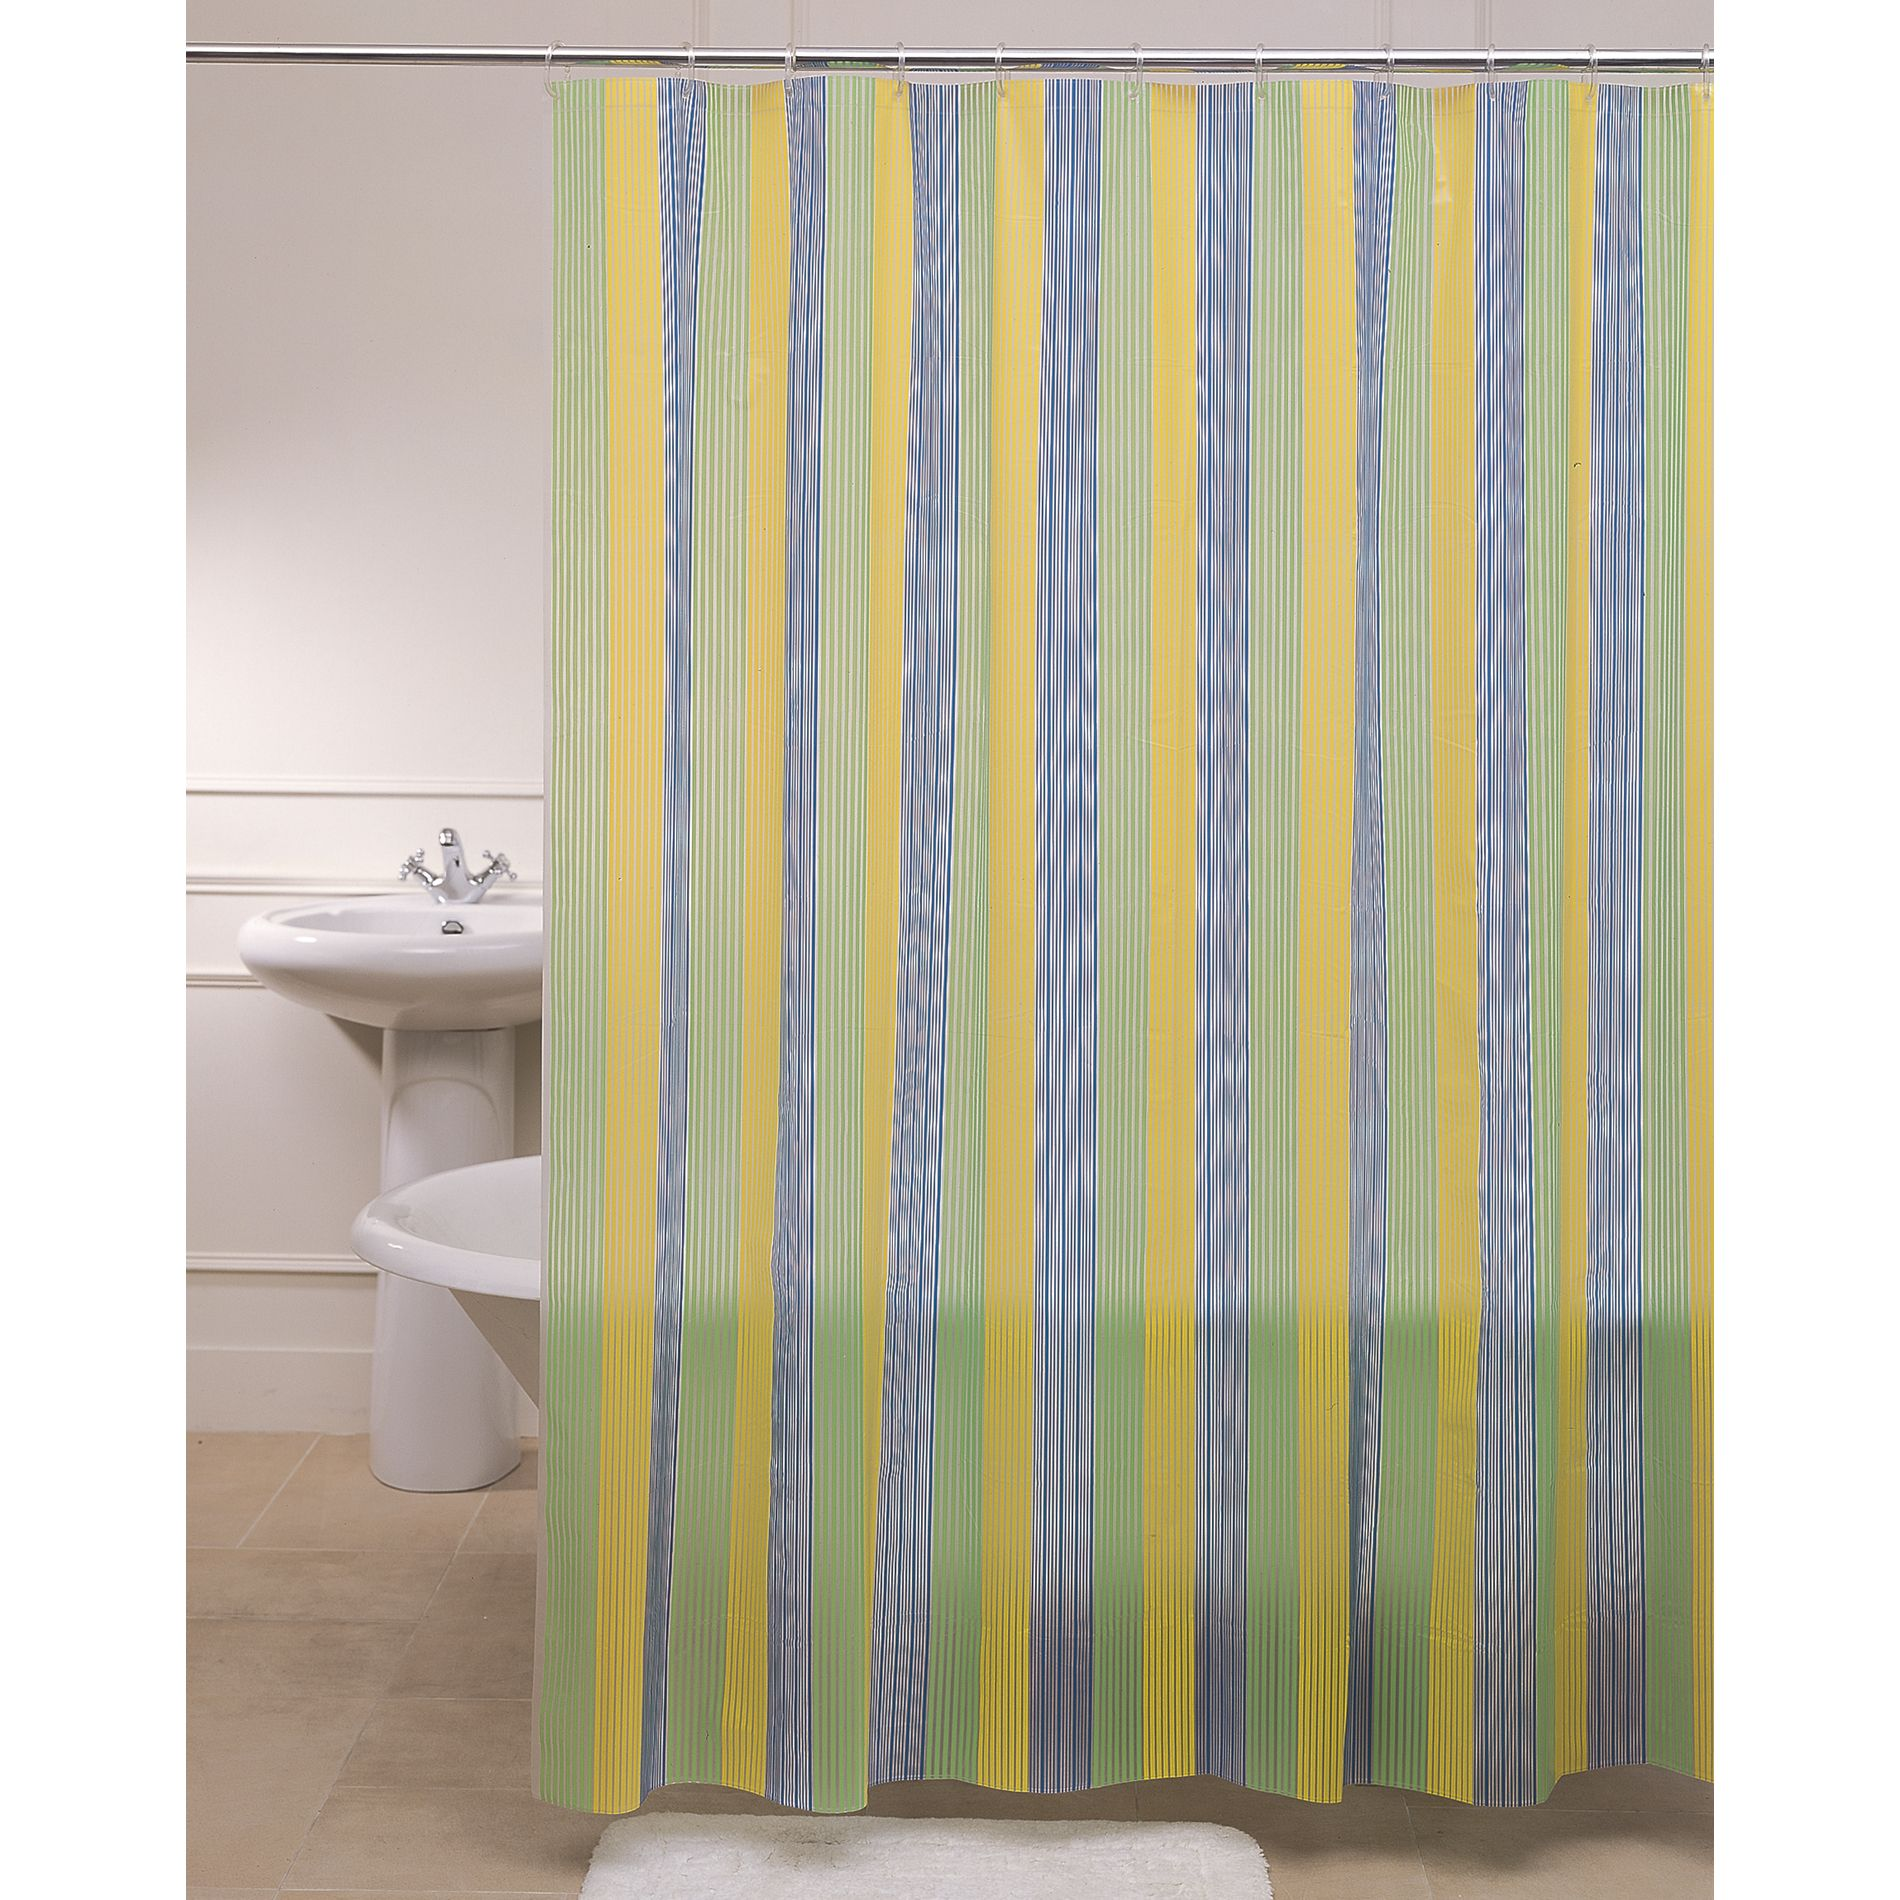 Shower Curtain Denim Stripes Vinyl Peva